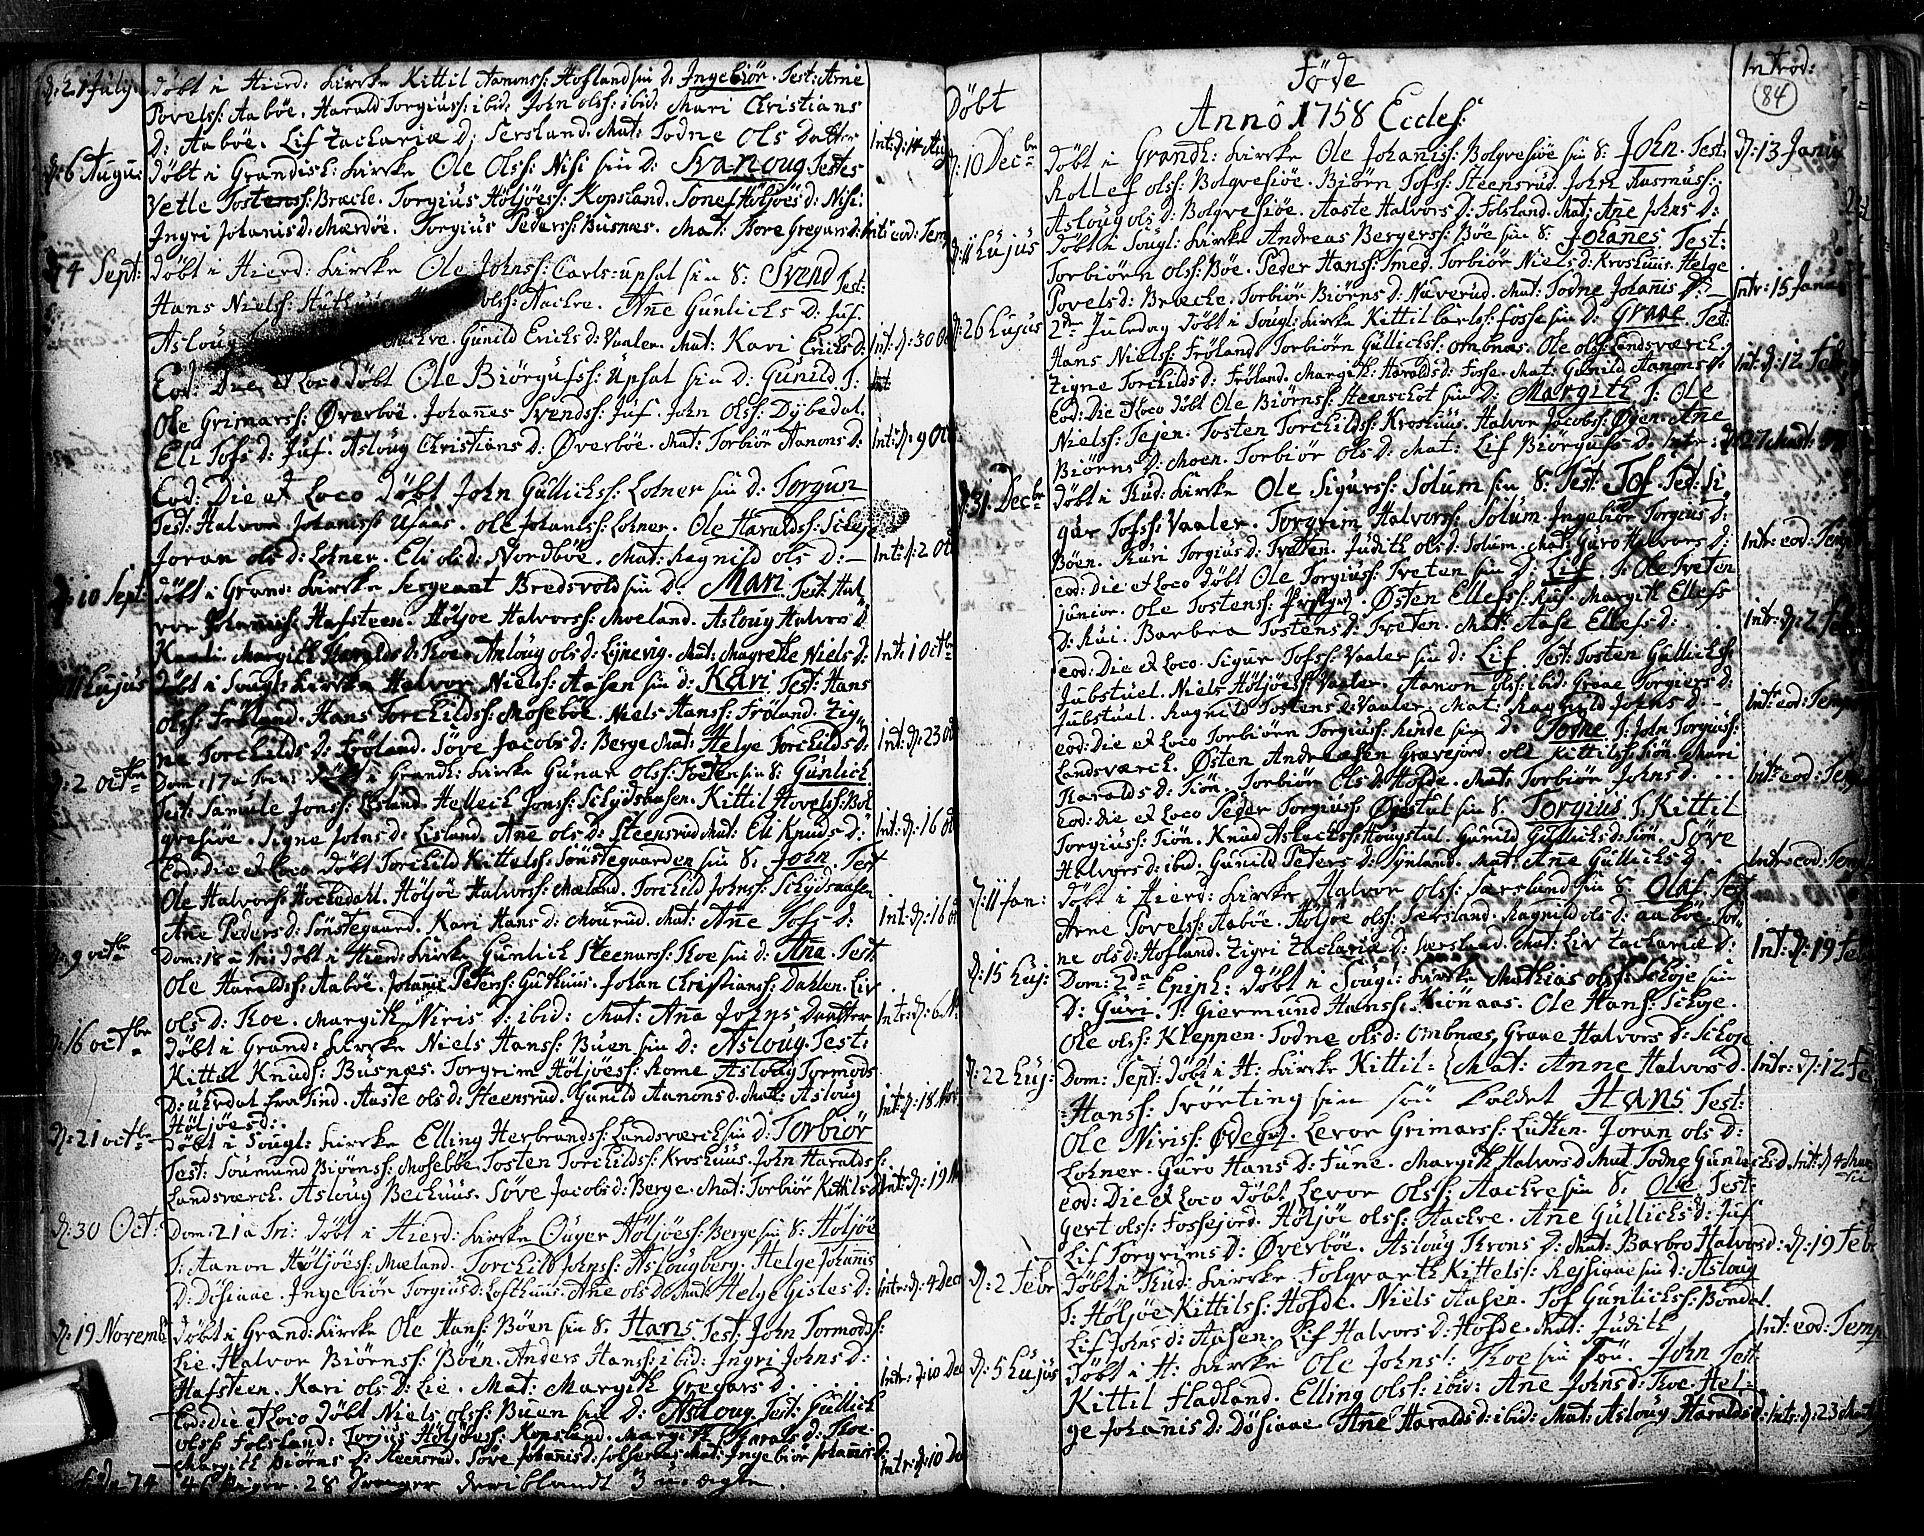 SAKO, Hjartdal kirkebøker, F/Fa/L0003: Ministerialbok nr. I 3, 1727-1775, s. 84